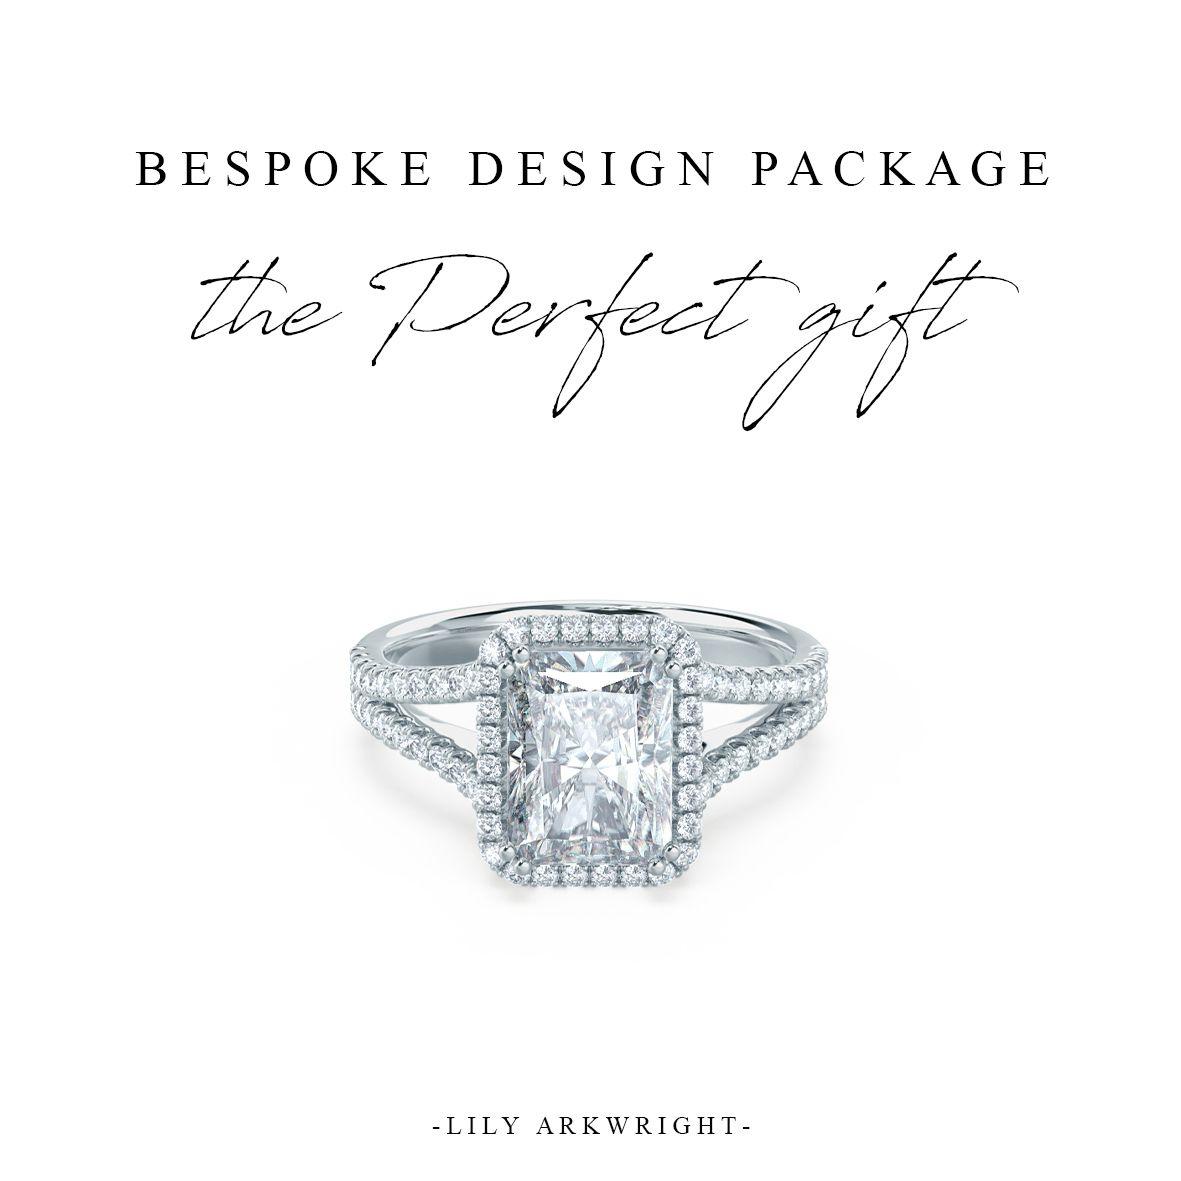 Bespoke Design Our Expert Team Will Guide You Through The Design